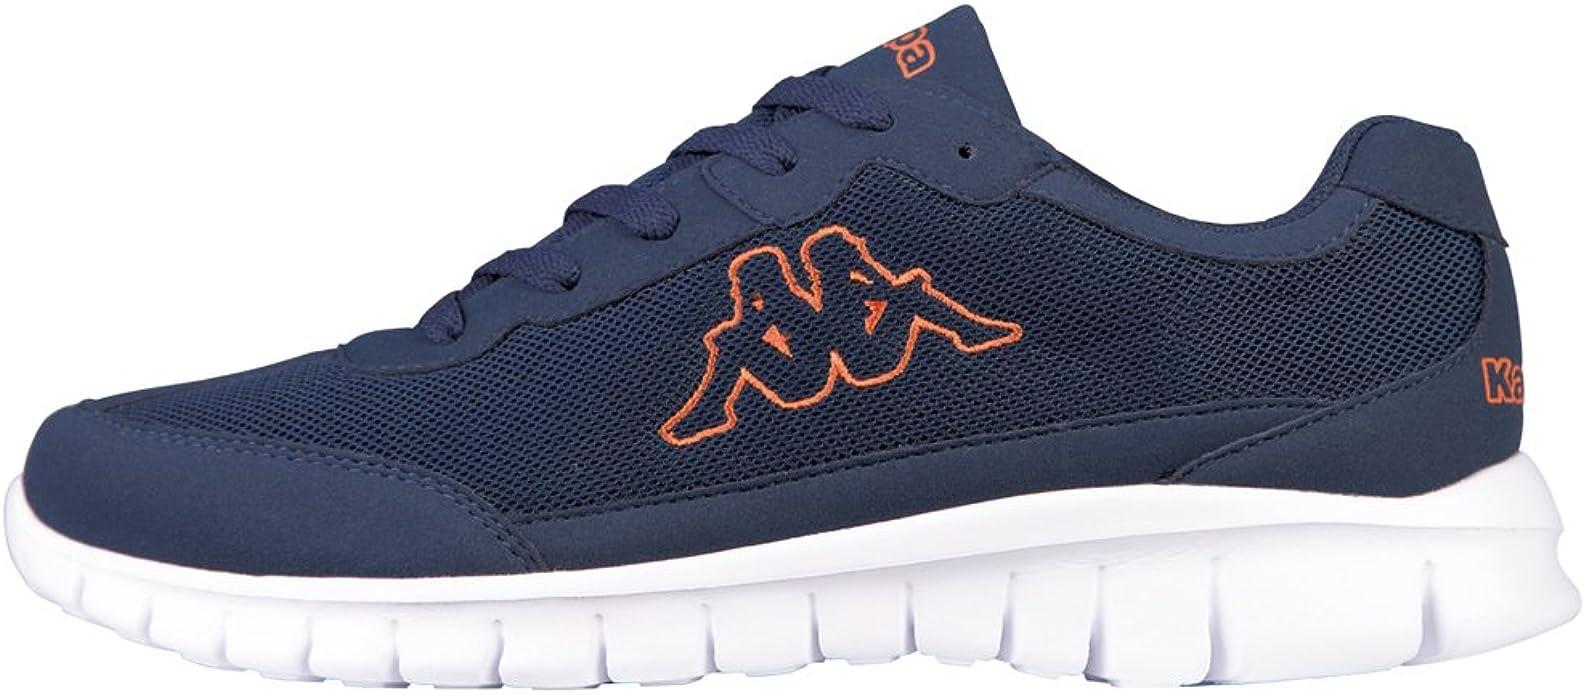 Kappa Rocket Sneakers Fitnesschuhe Damen Herren Unisex Blau